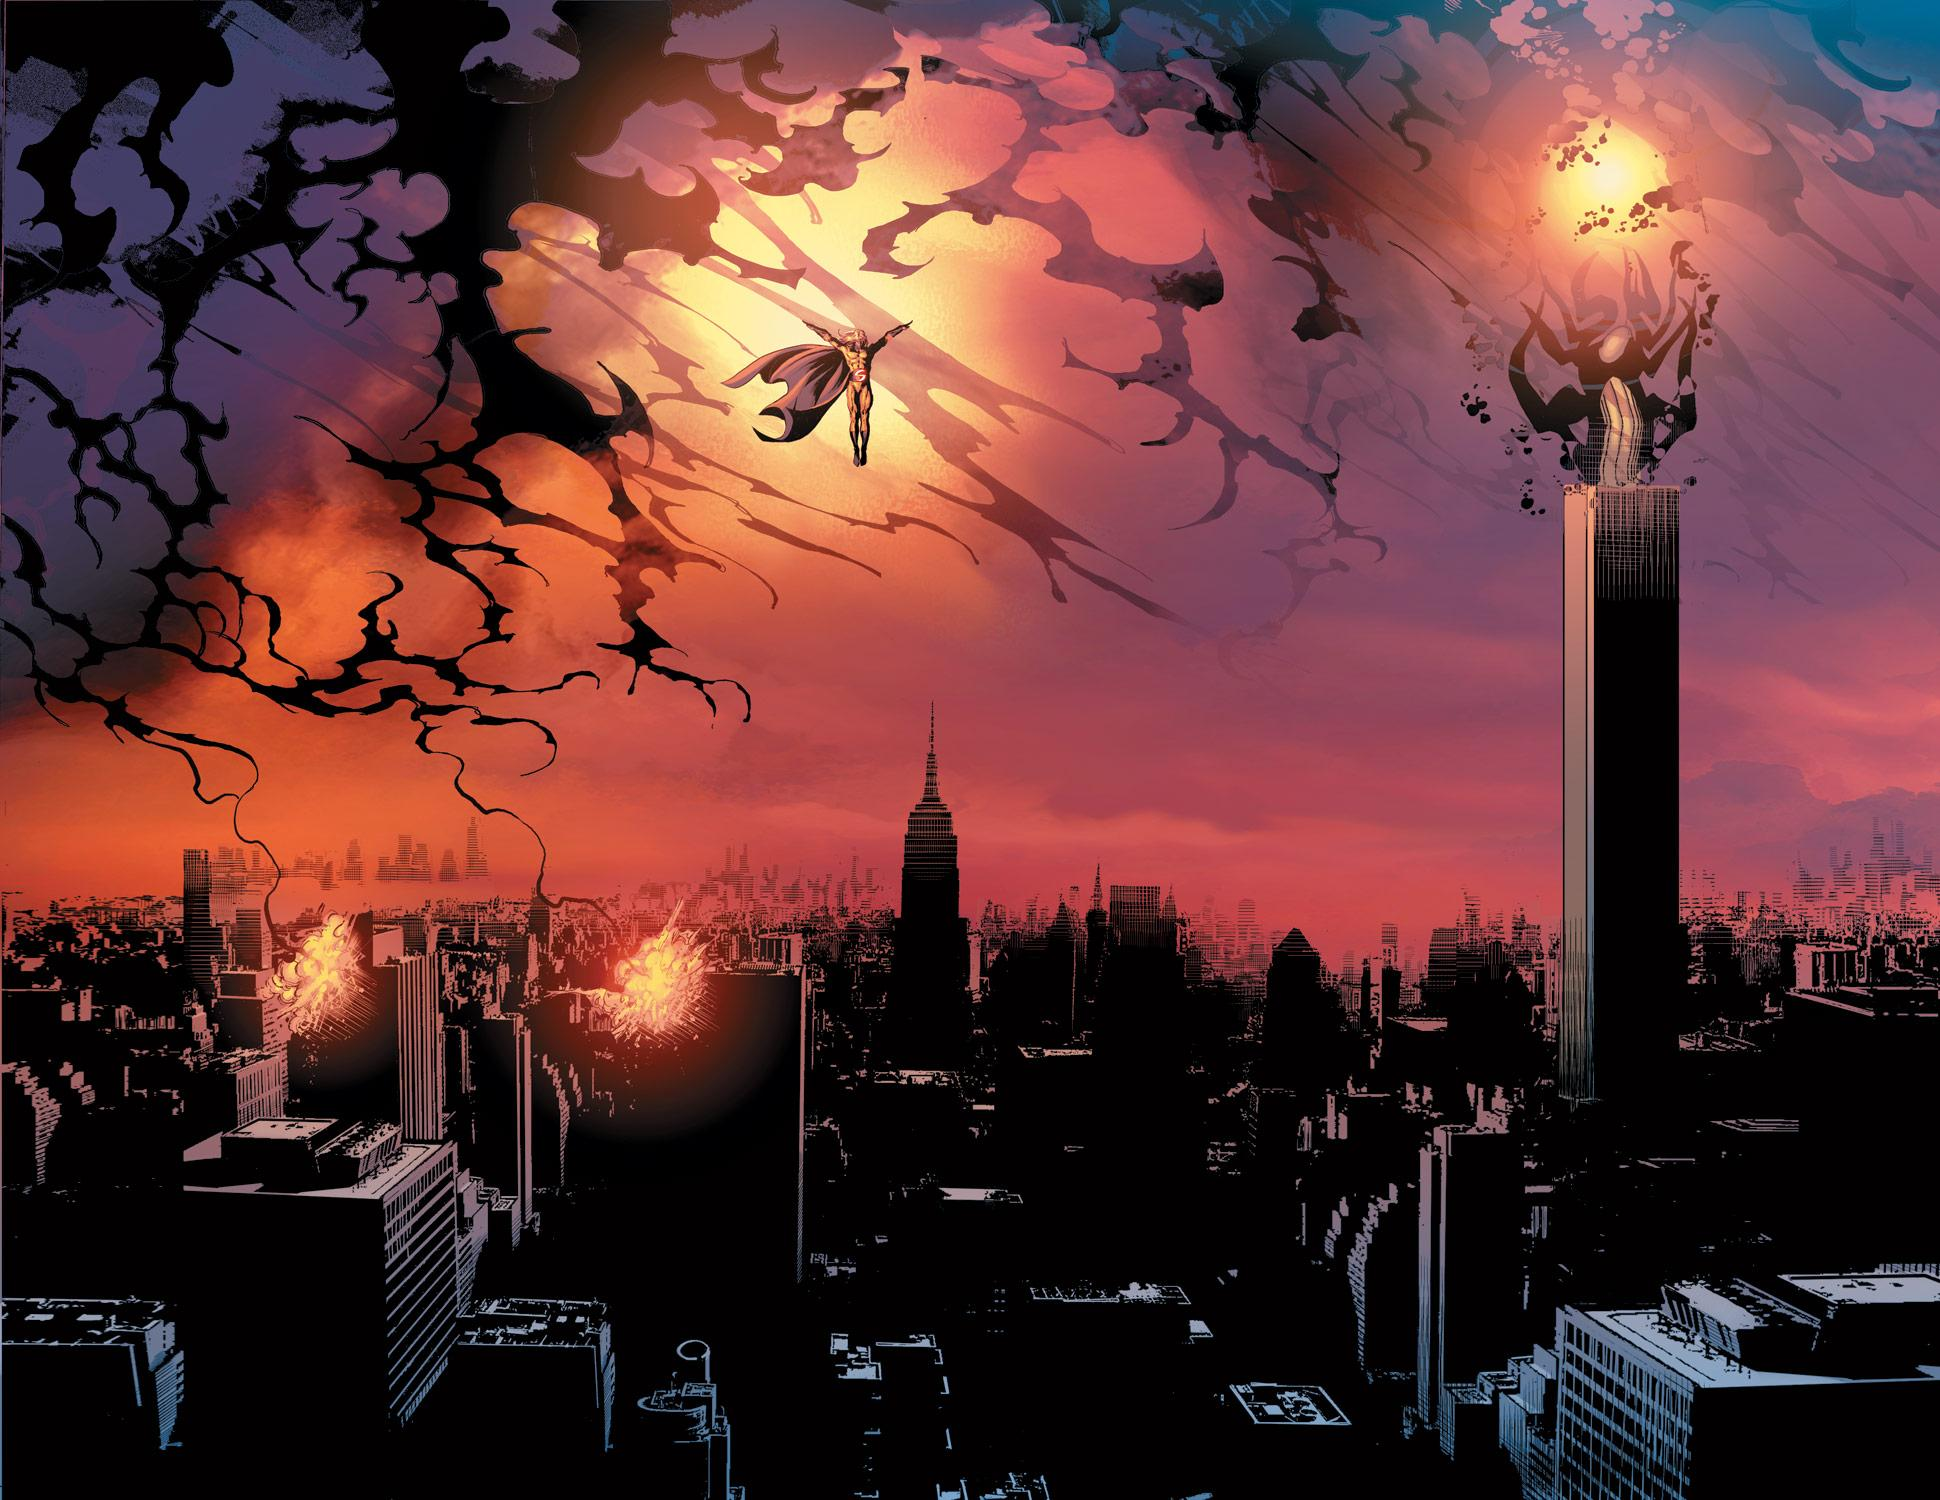 Dark Avengers Siege review